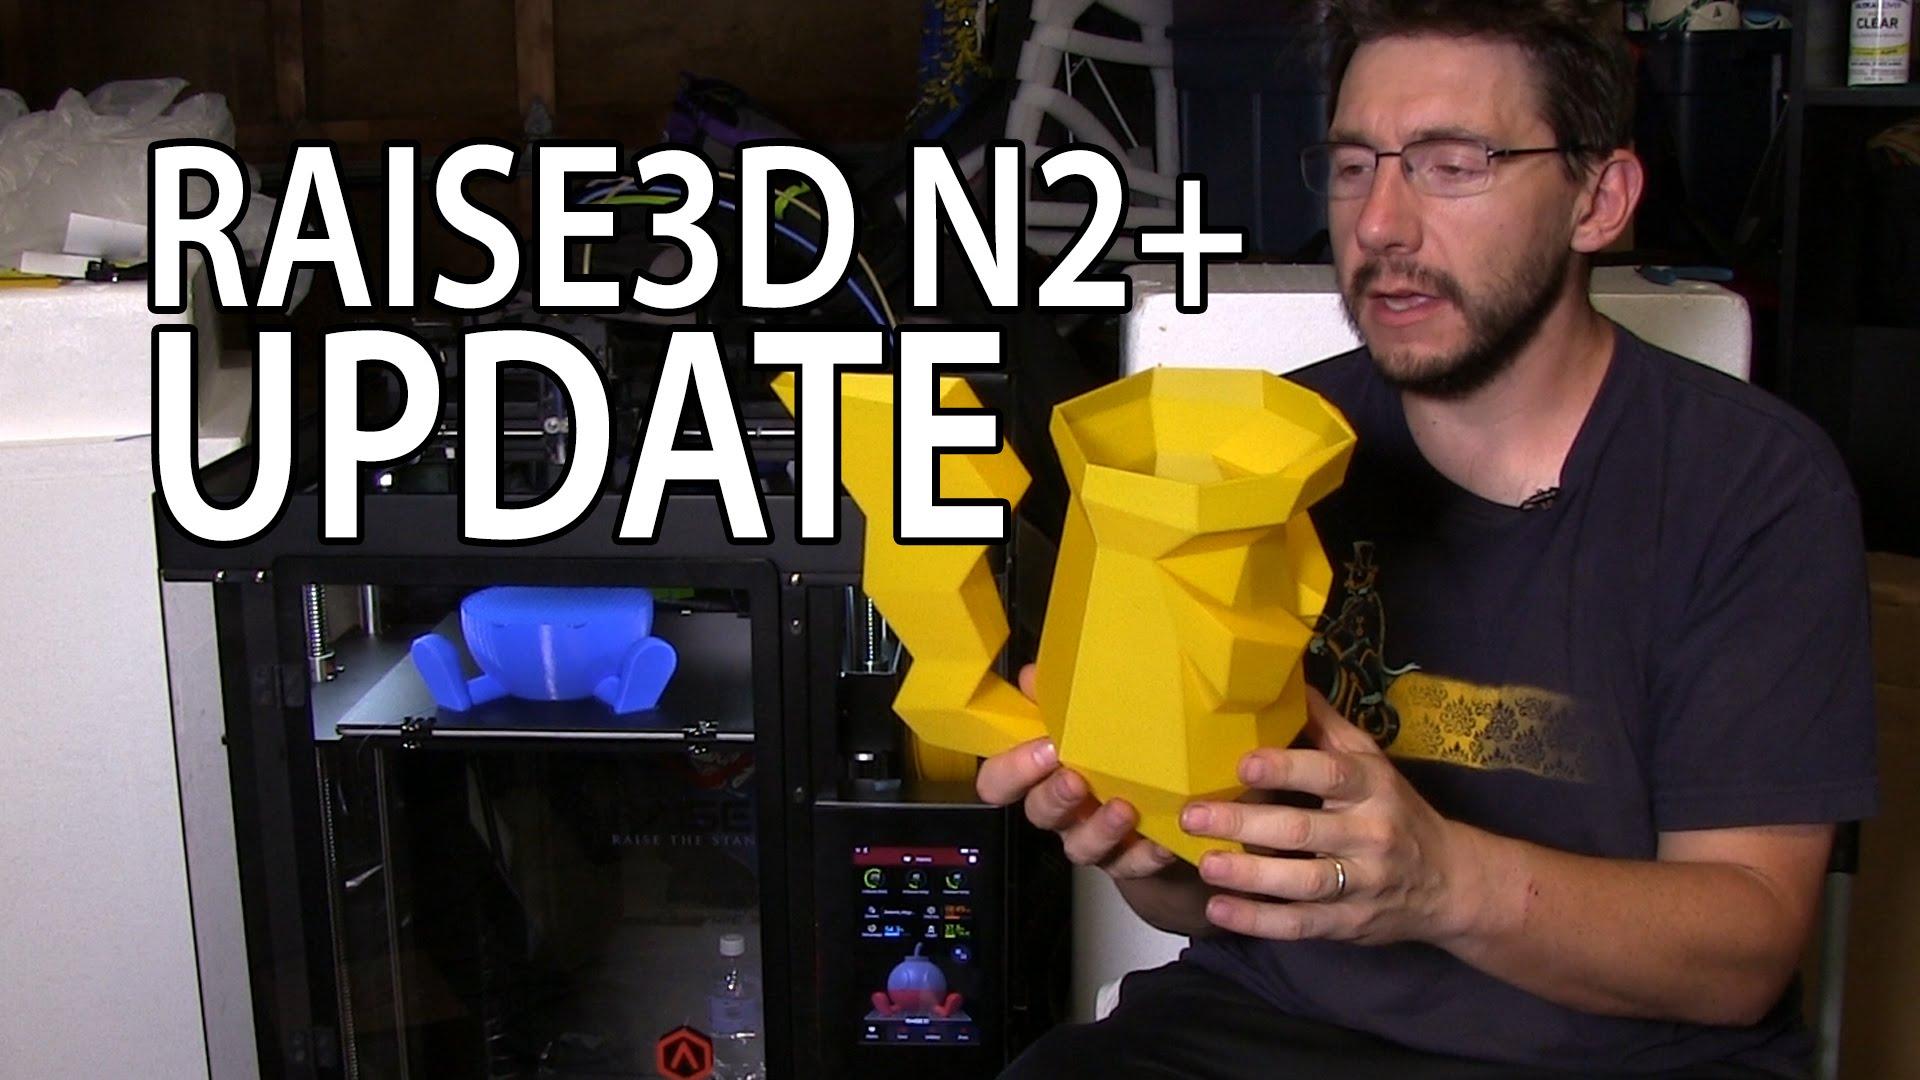 3D Printer: Raise3D N2+ Update